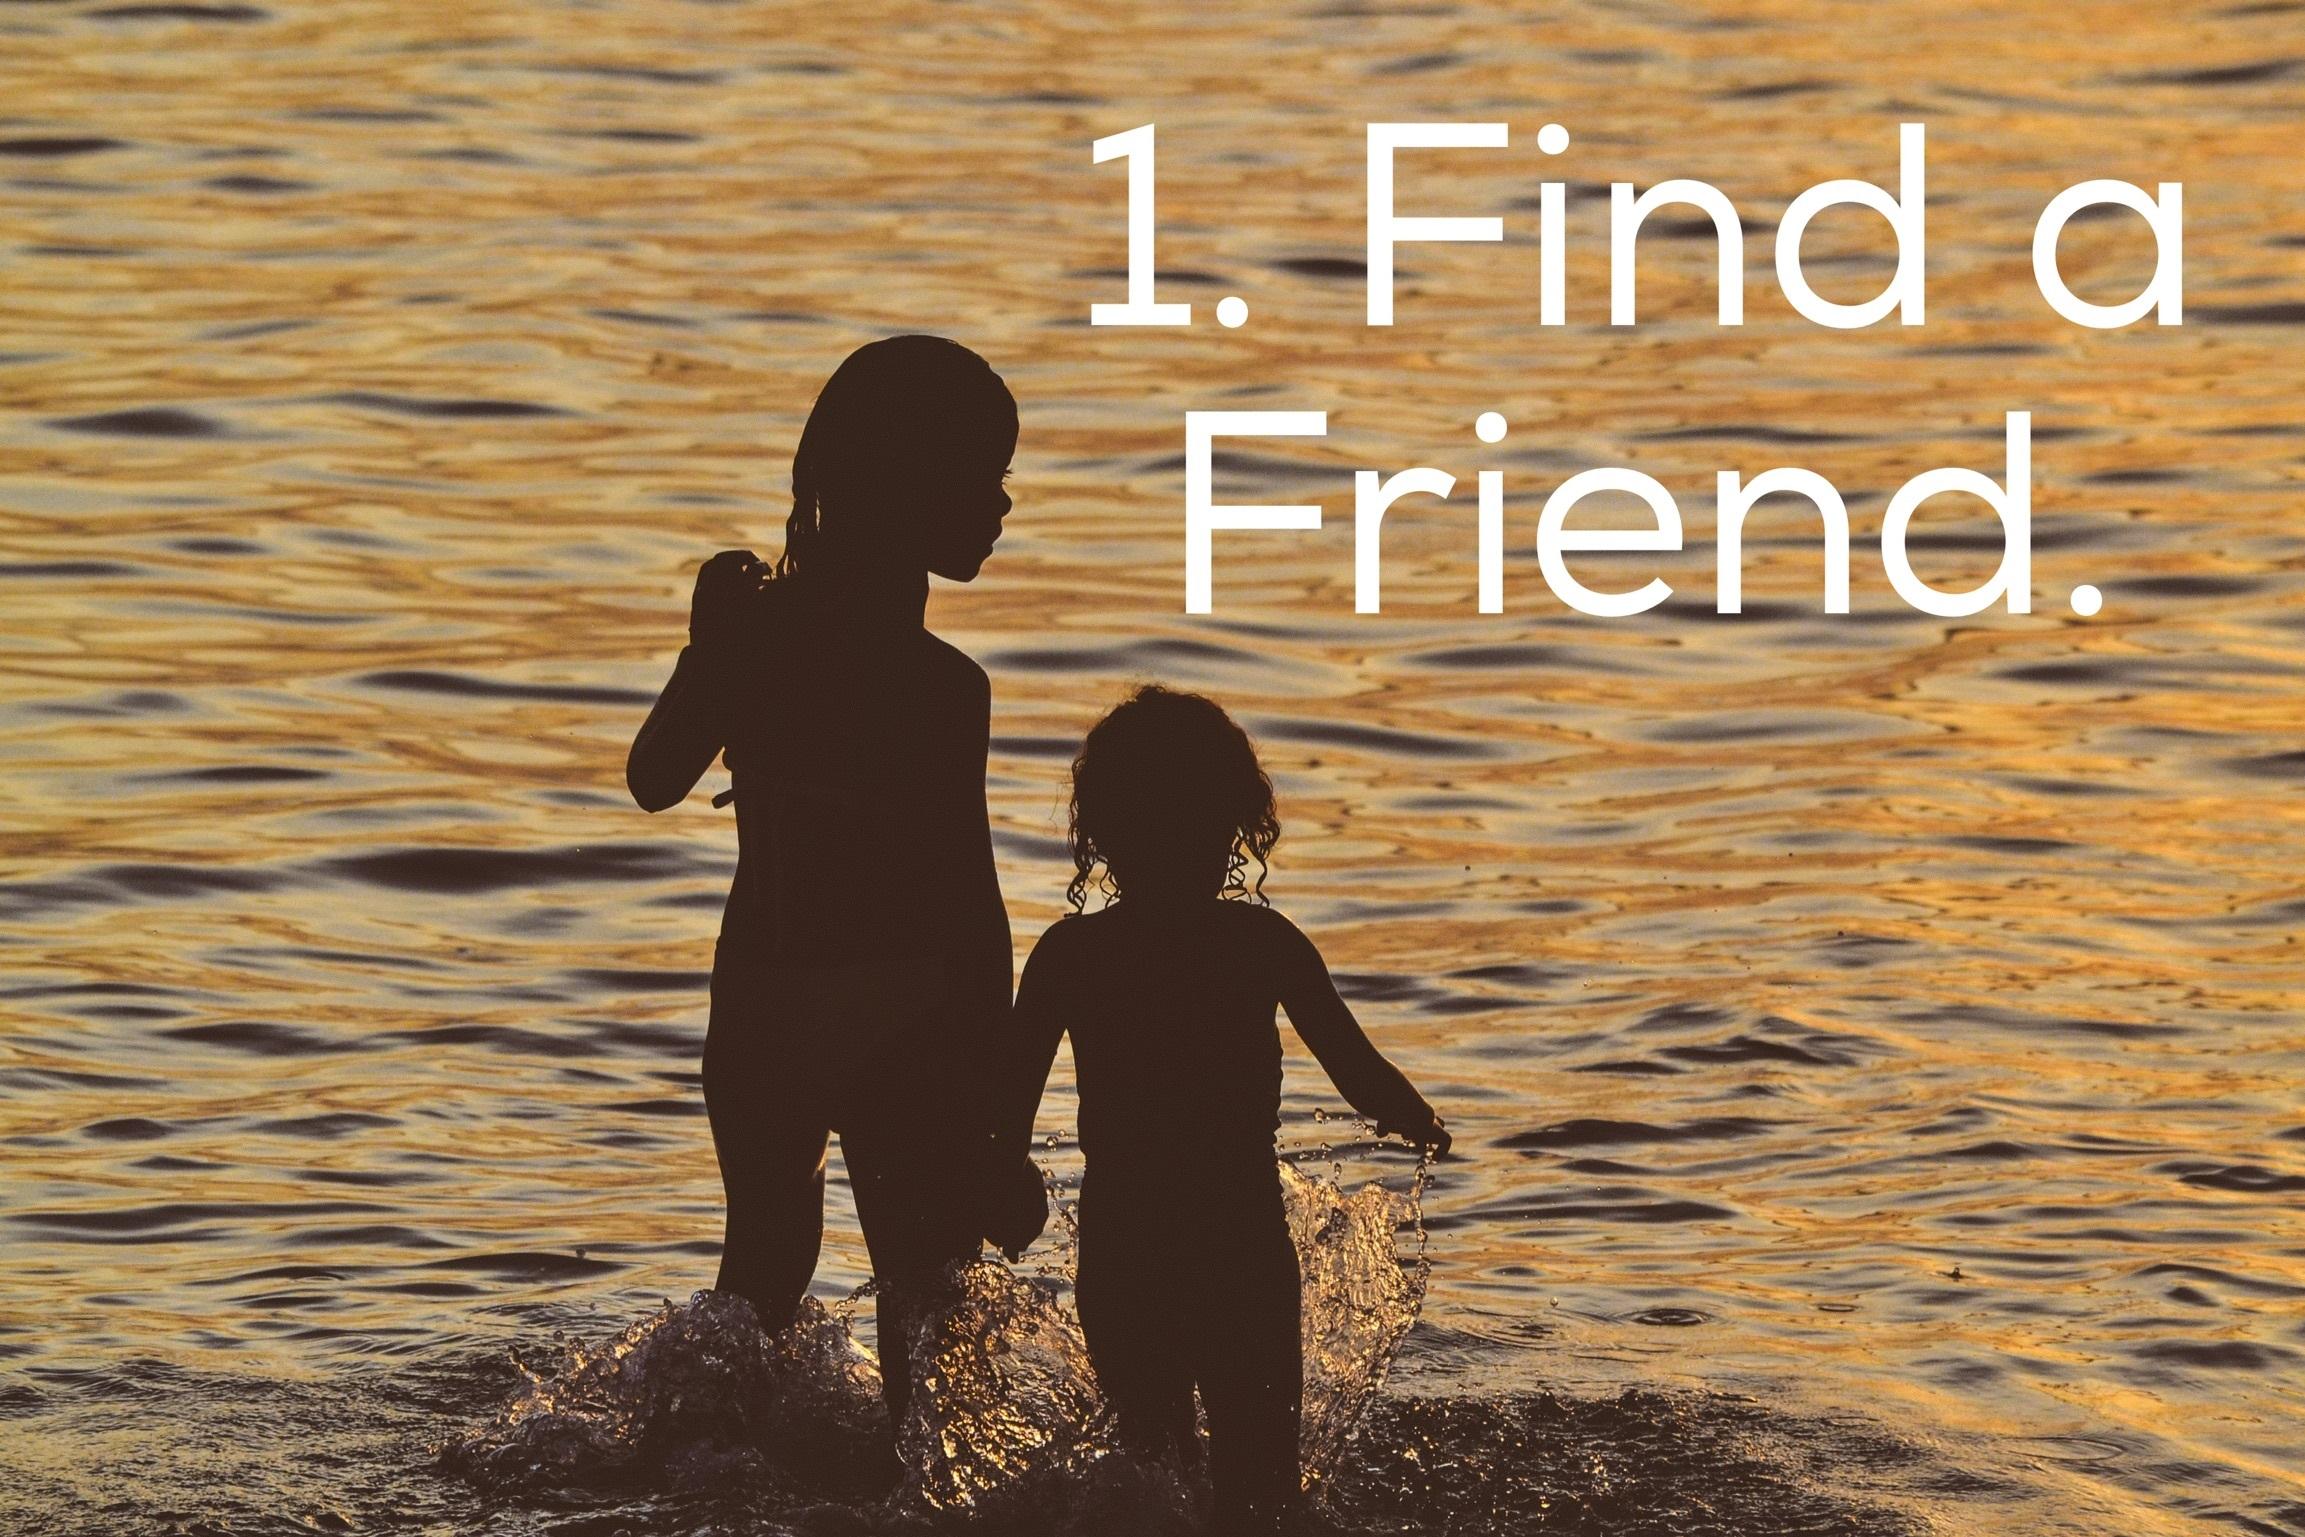 fasd-wishes-friend